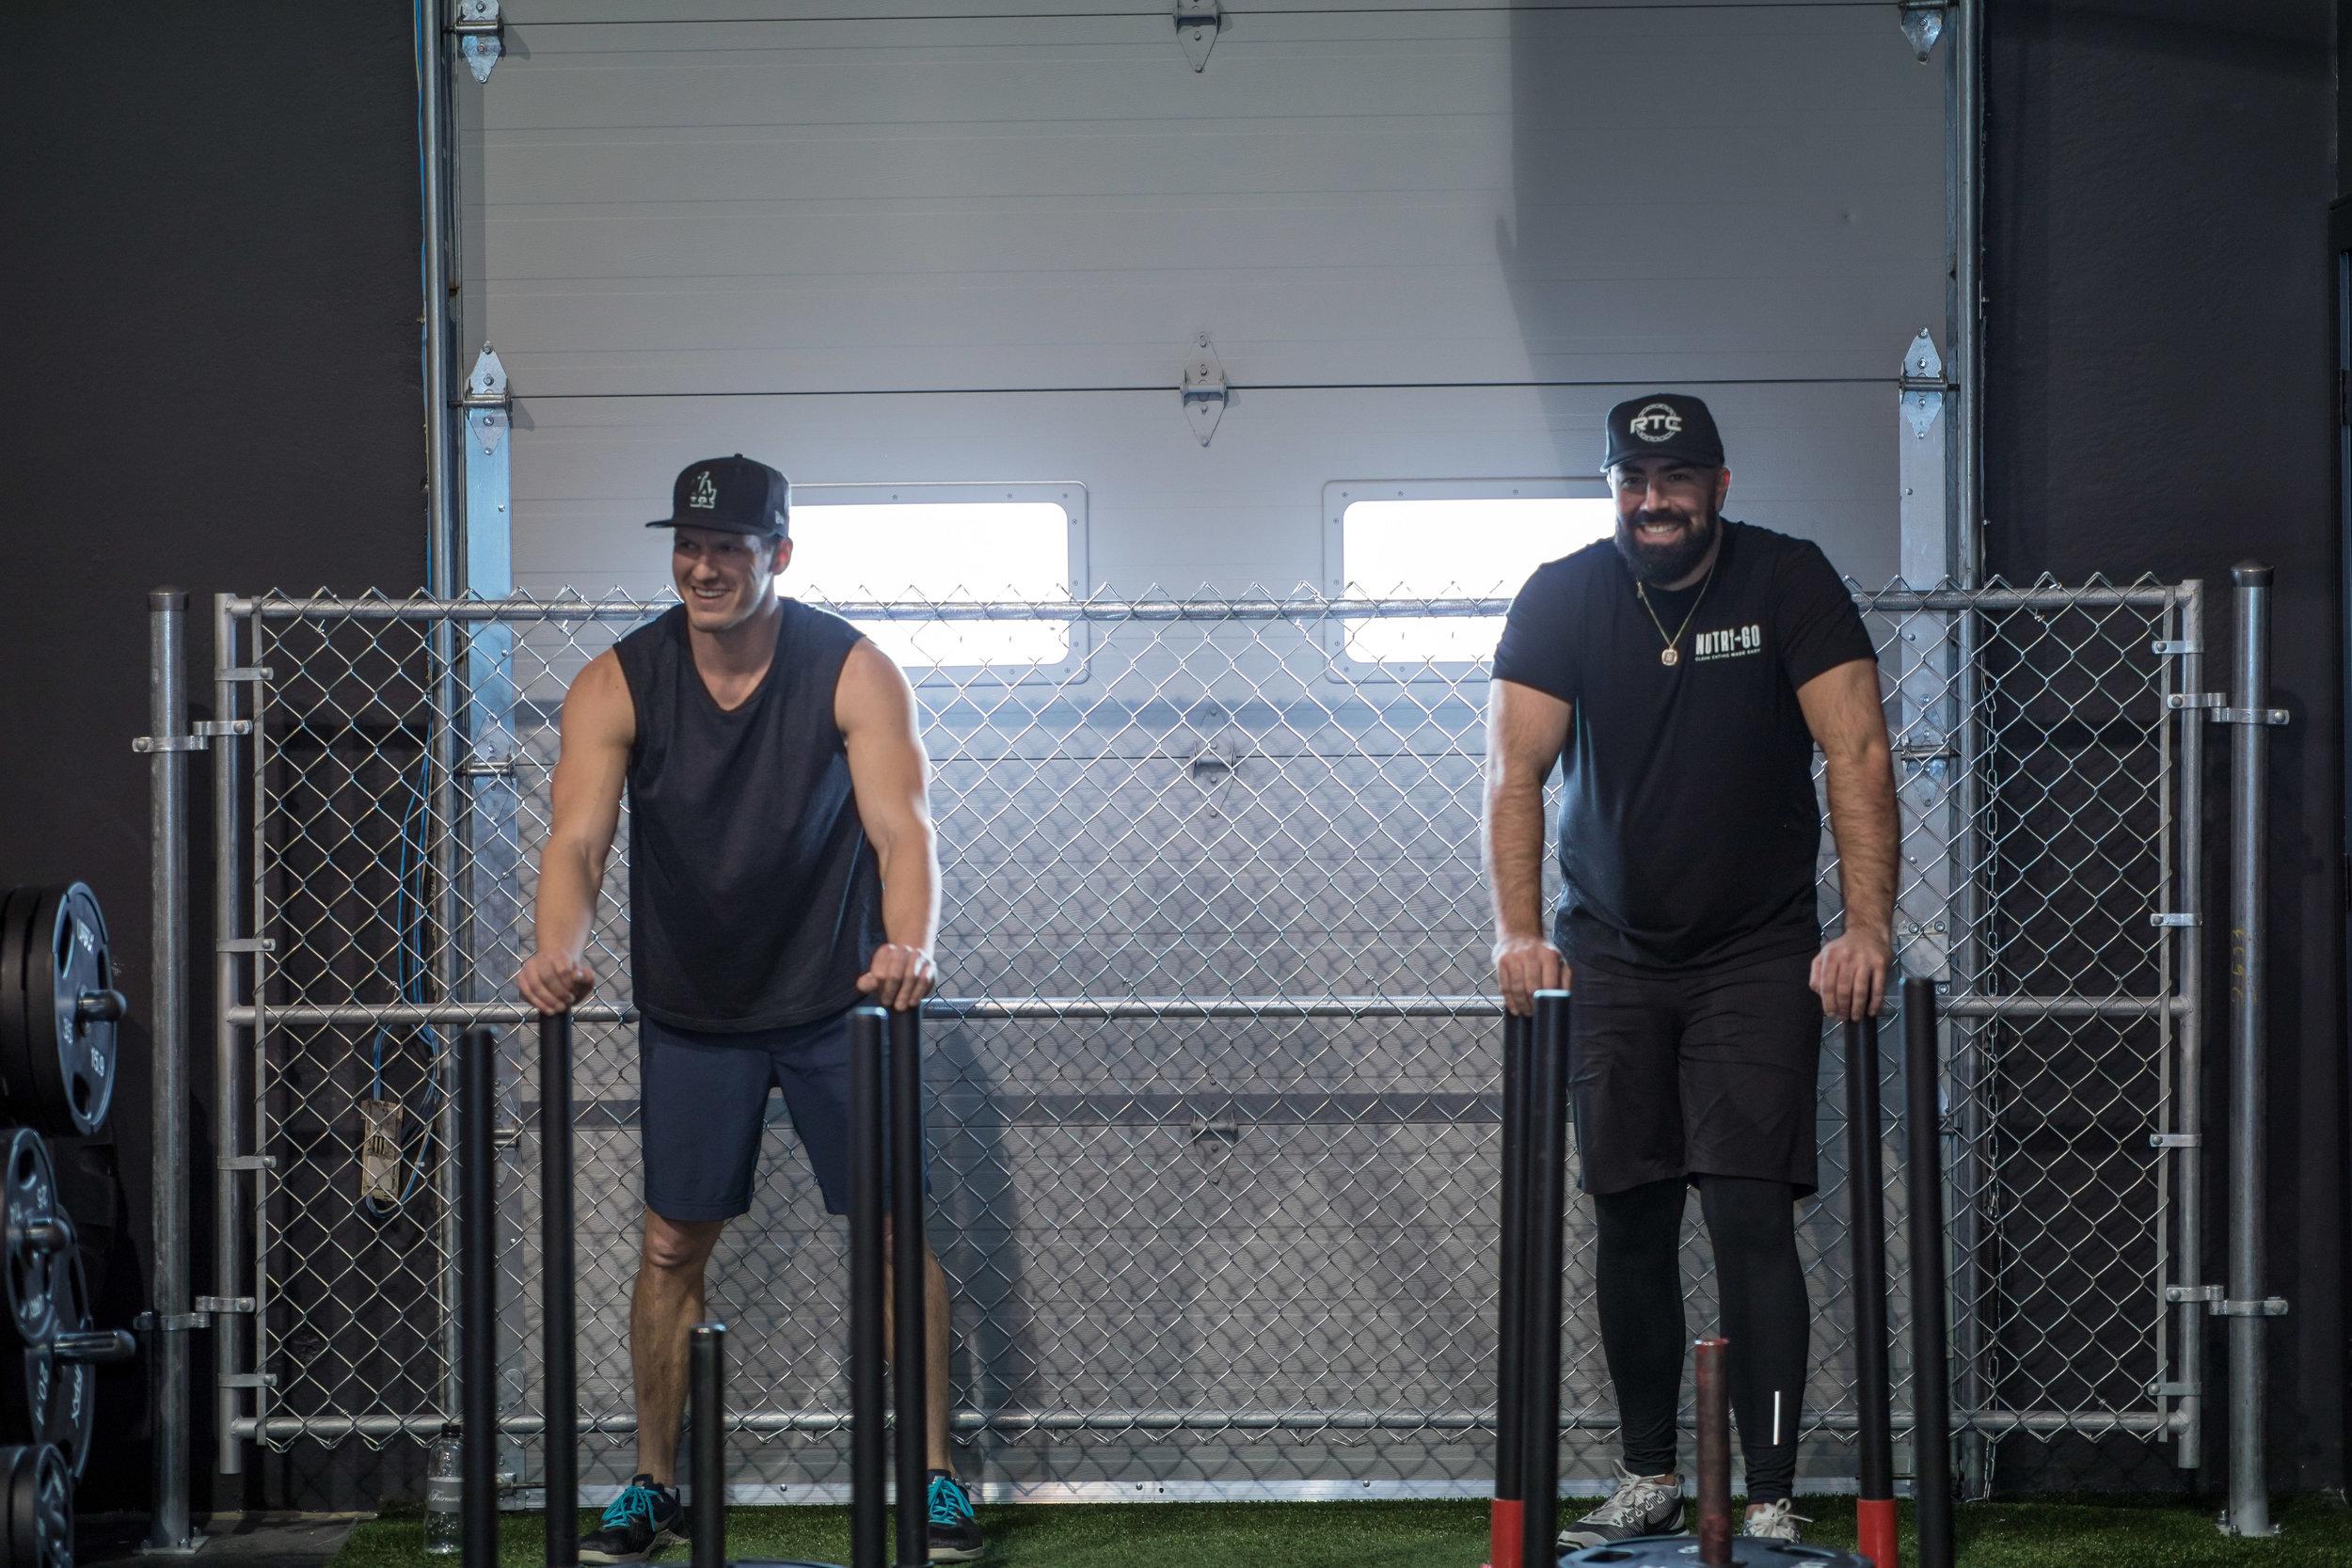 2019 02-02 Renegade Training Company - Calgary 391.jpg